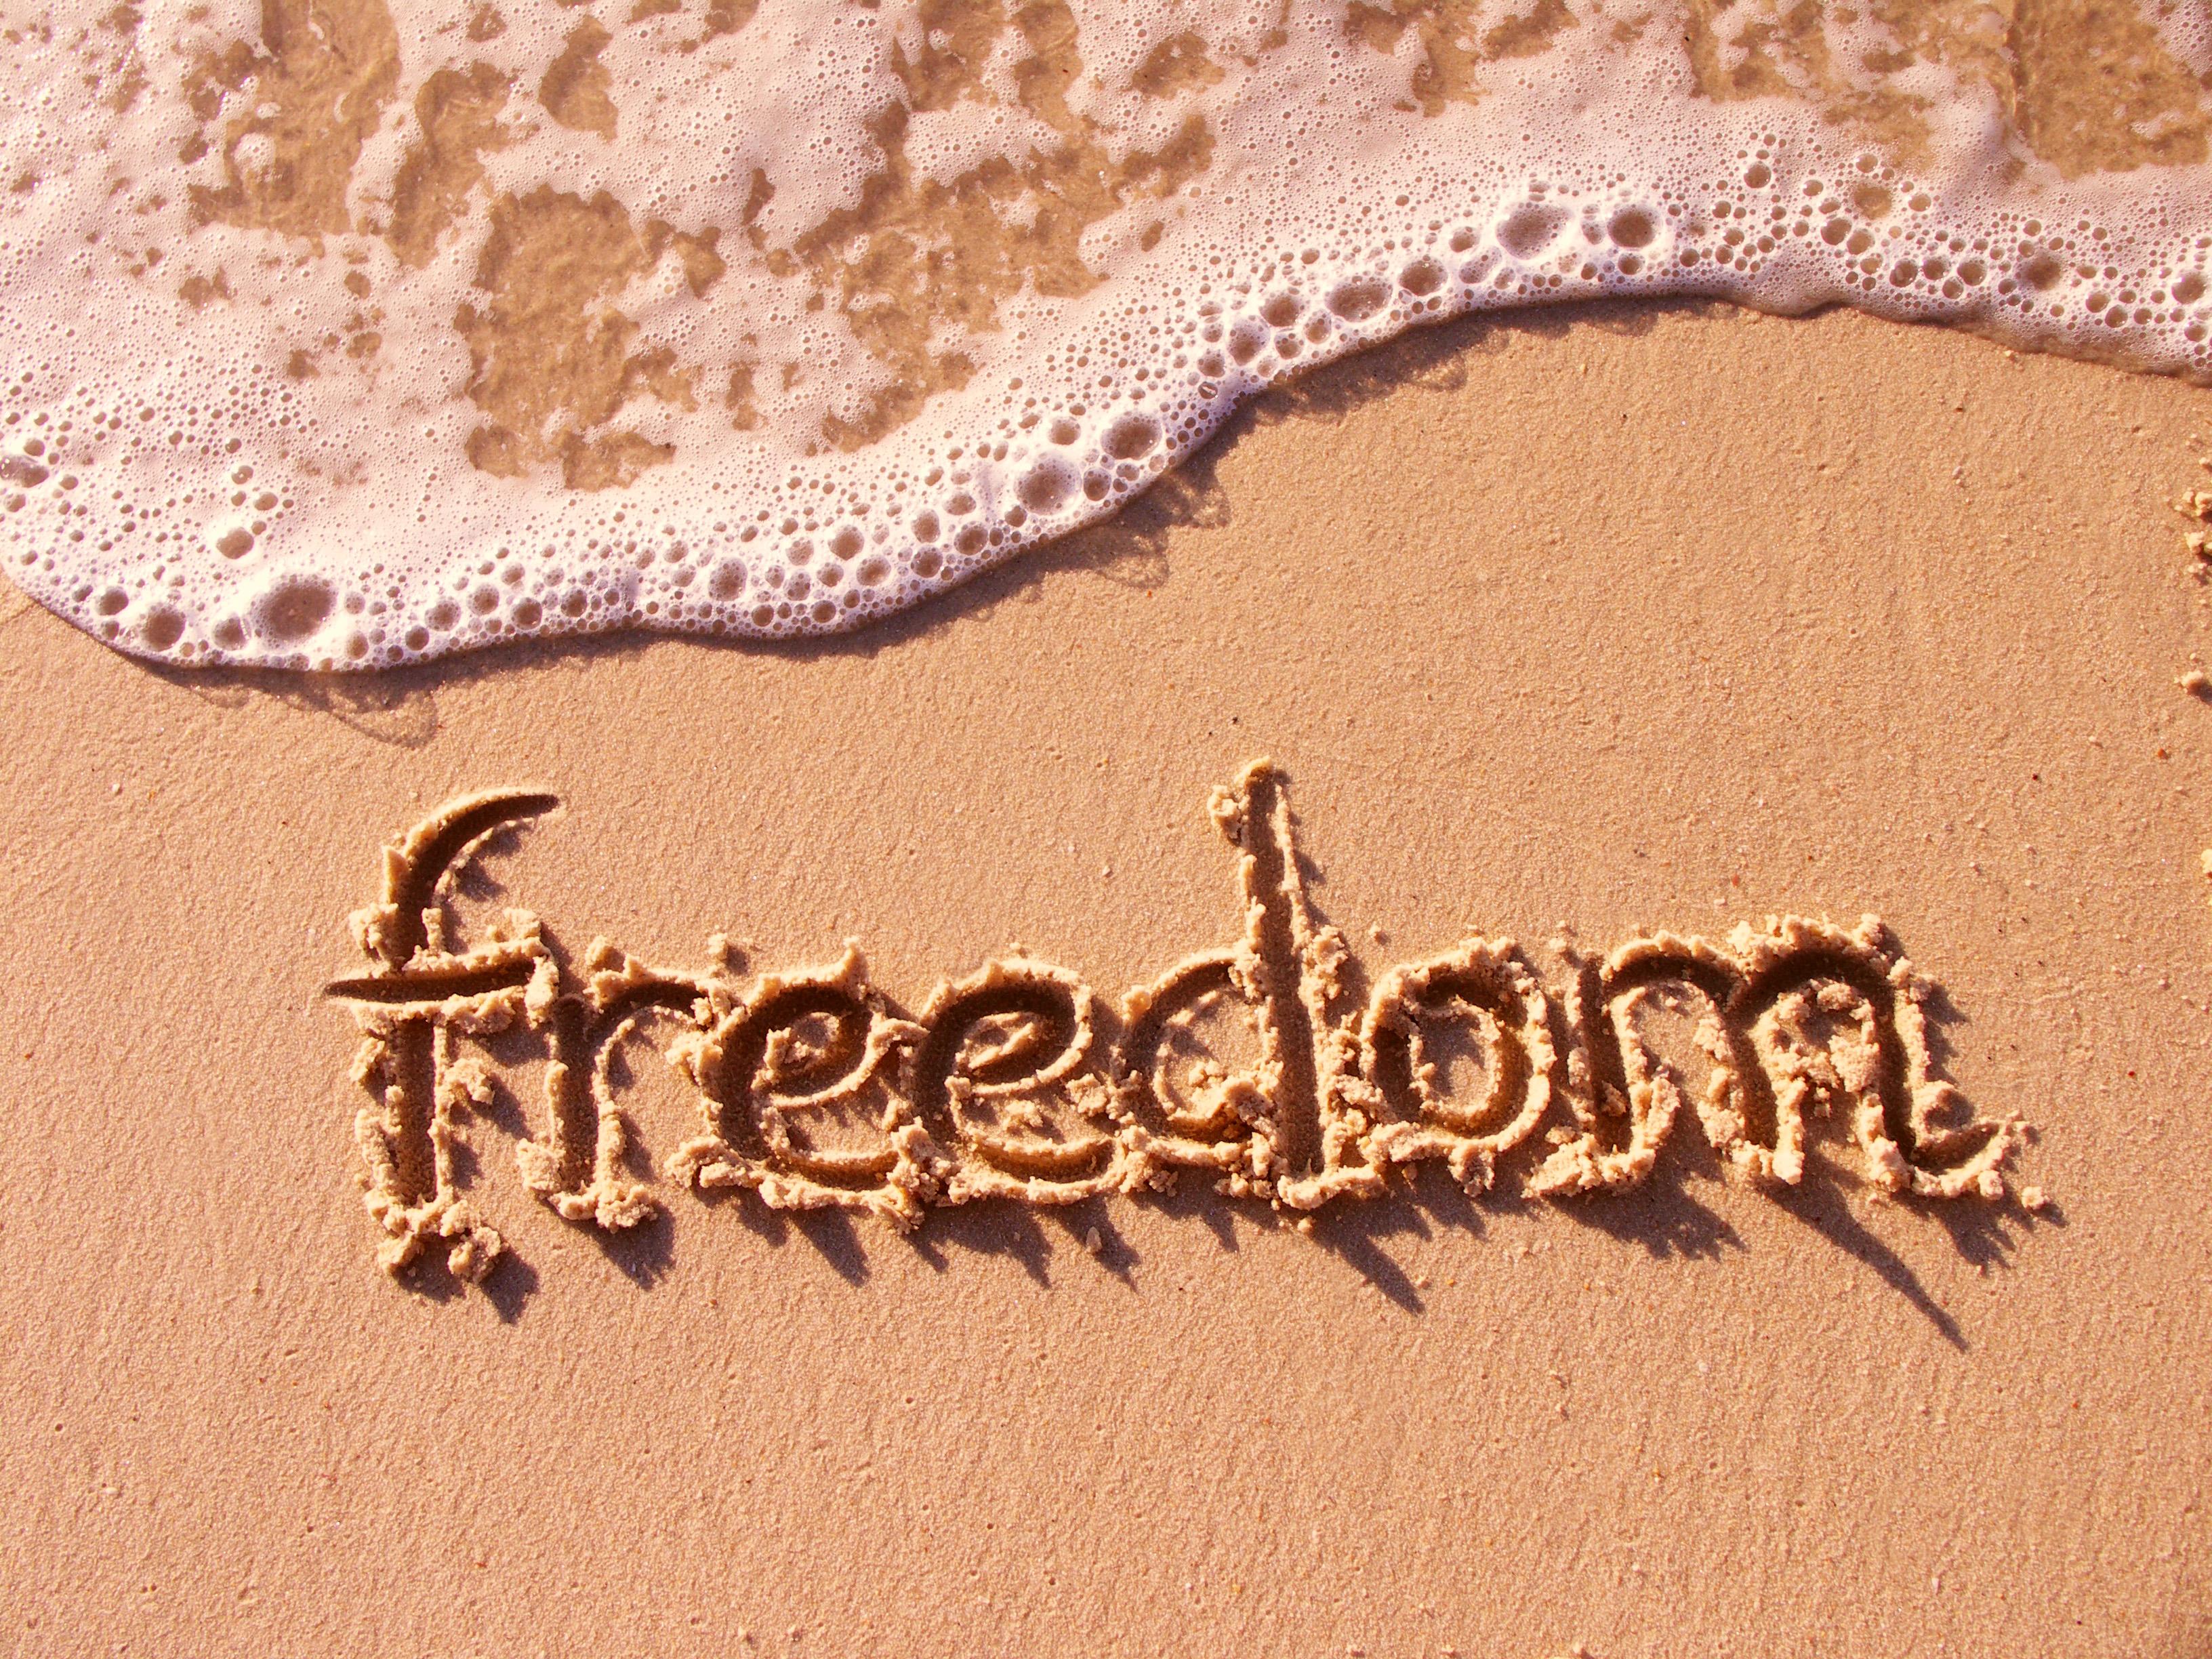 Freedom HD wallpapers, Desktop wallpaper - most viewed